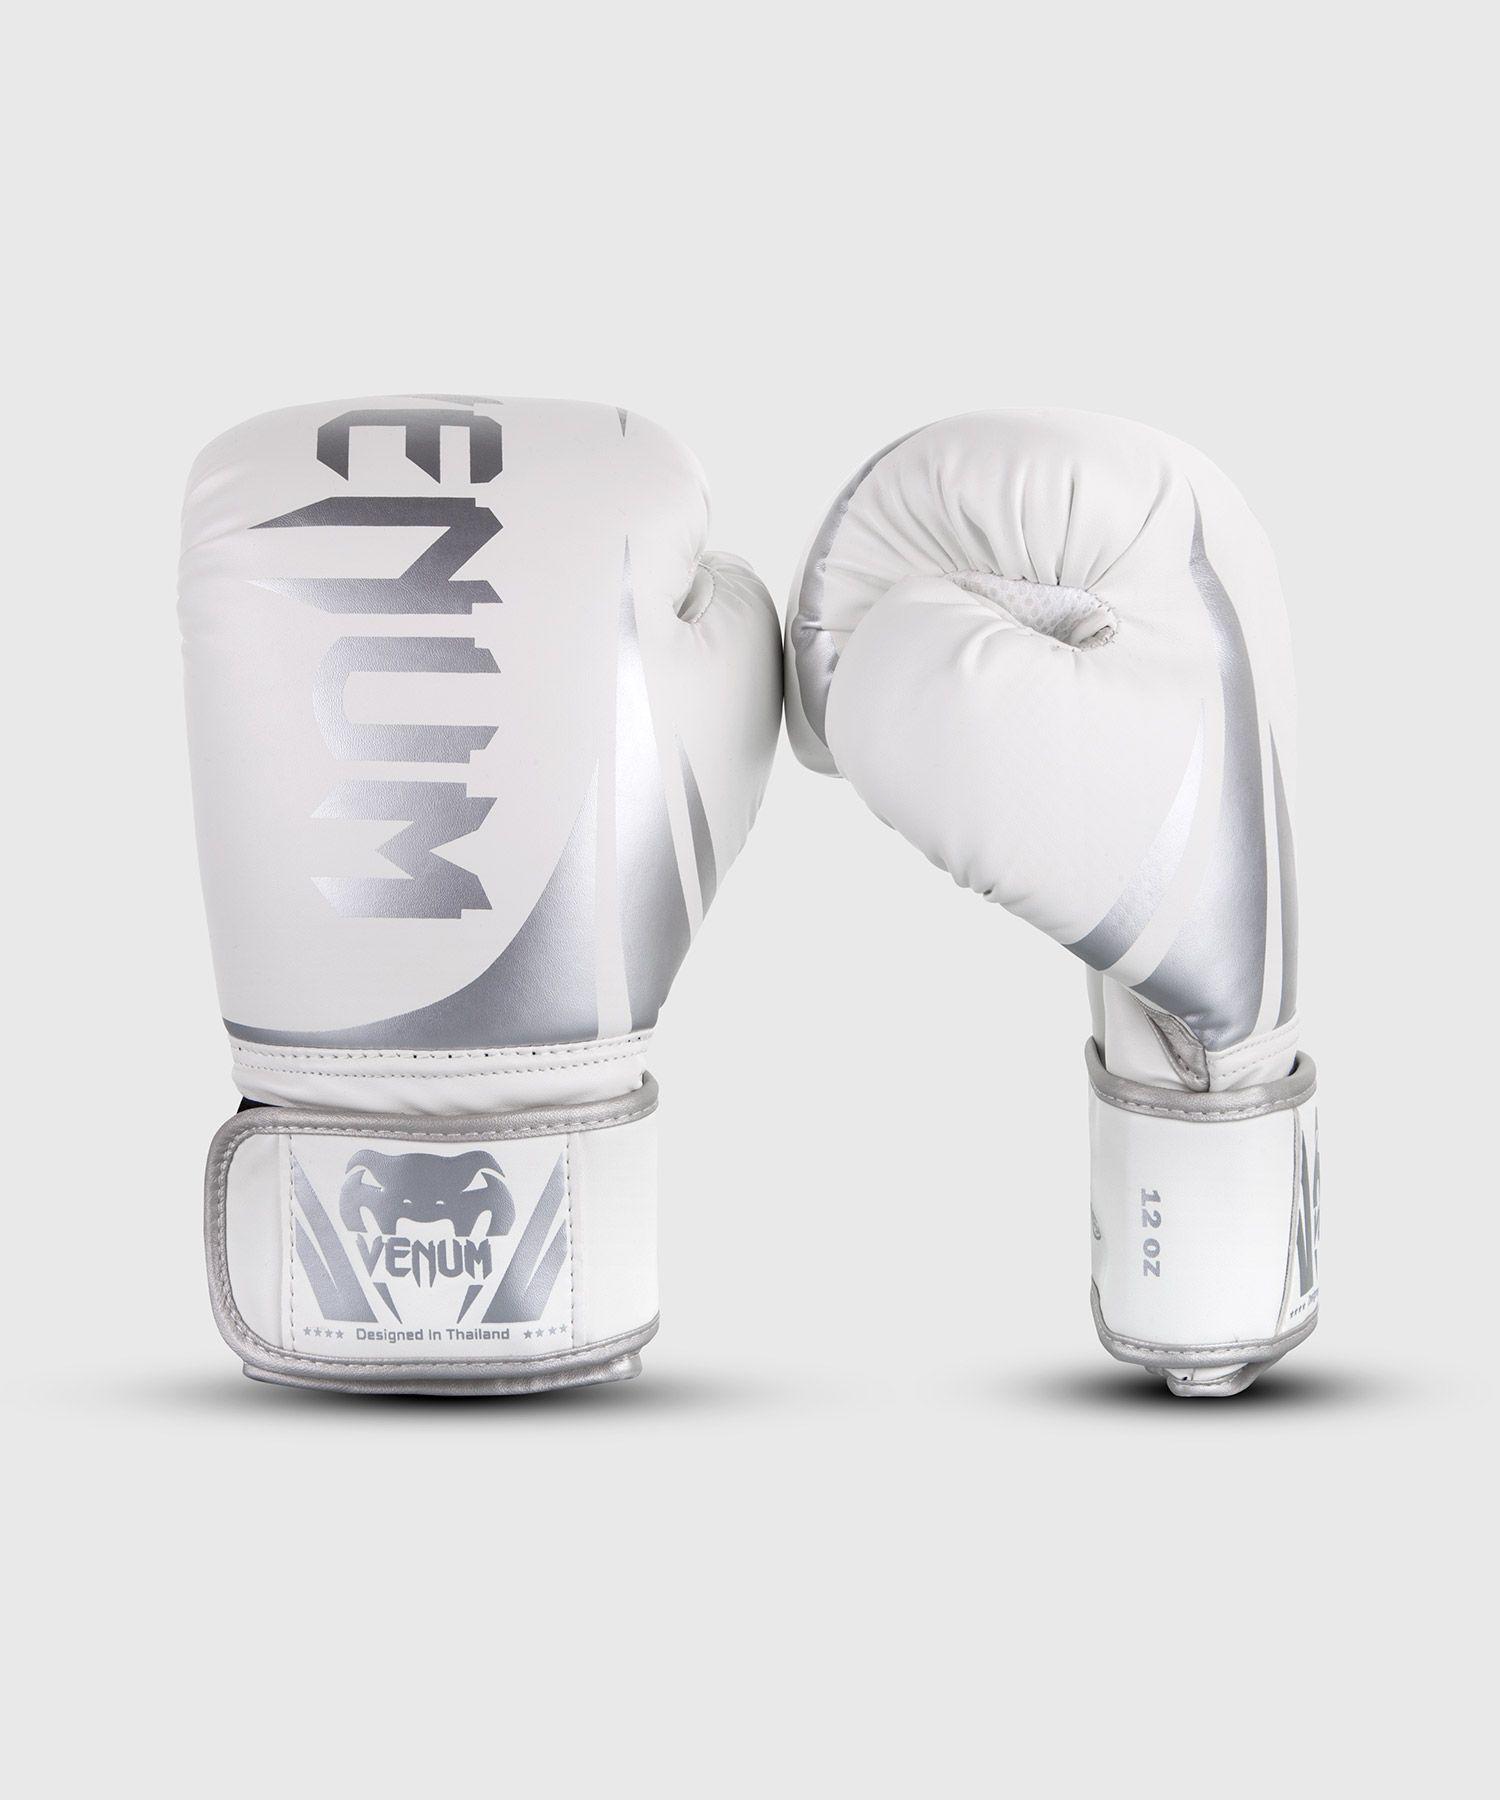 Venum Challenger 2.0 Boxing Gloves - White/Silver